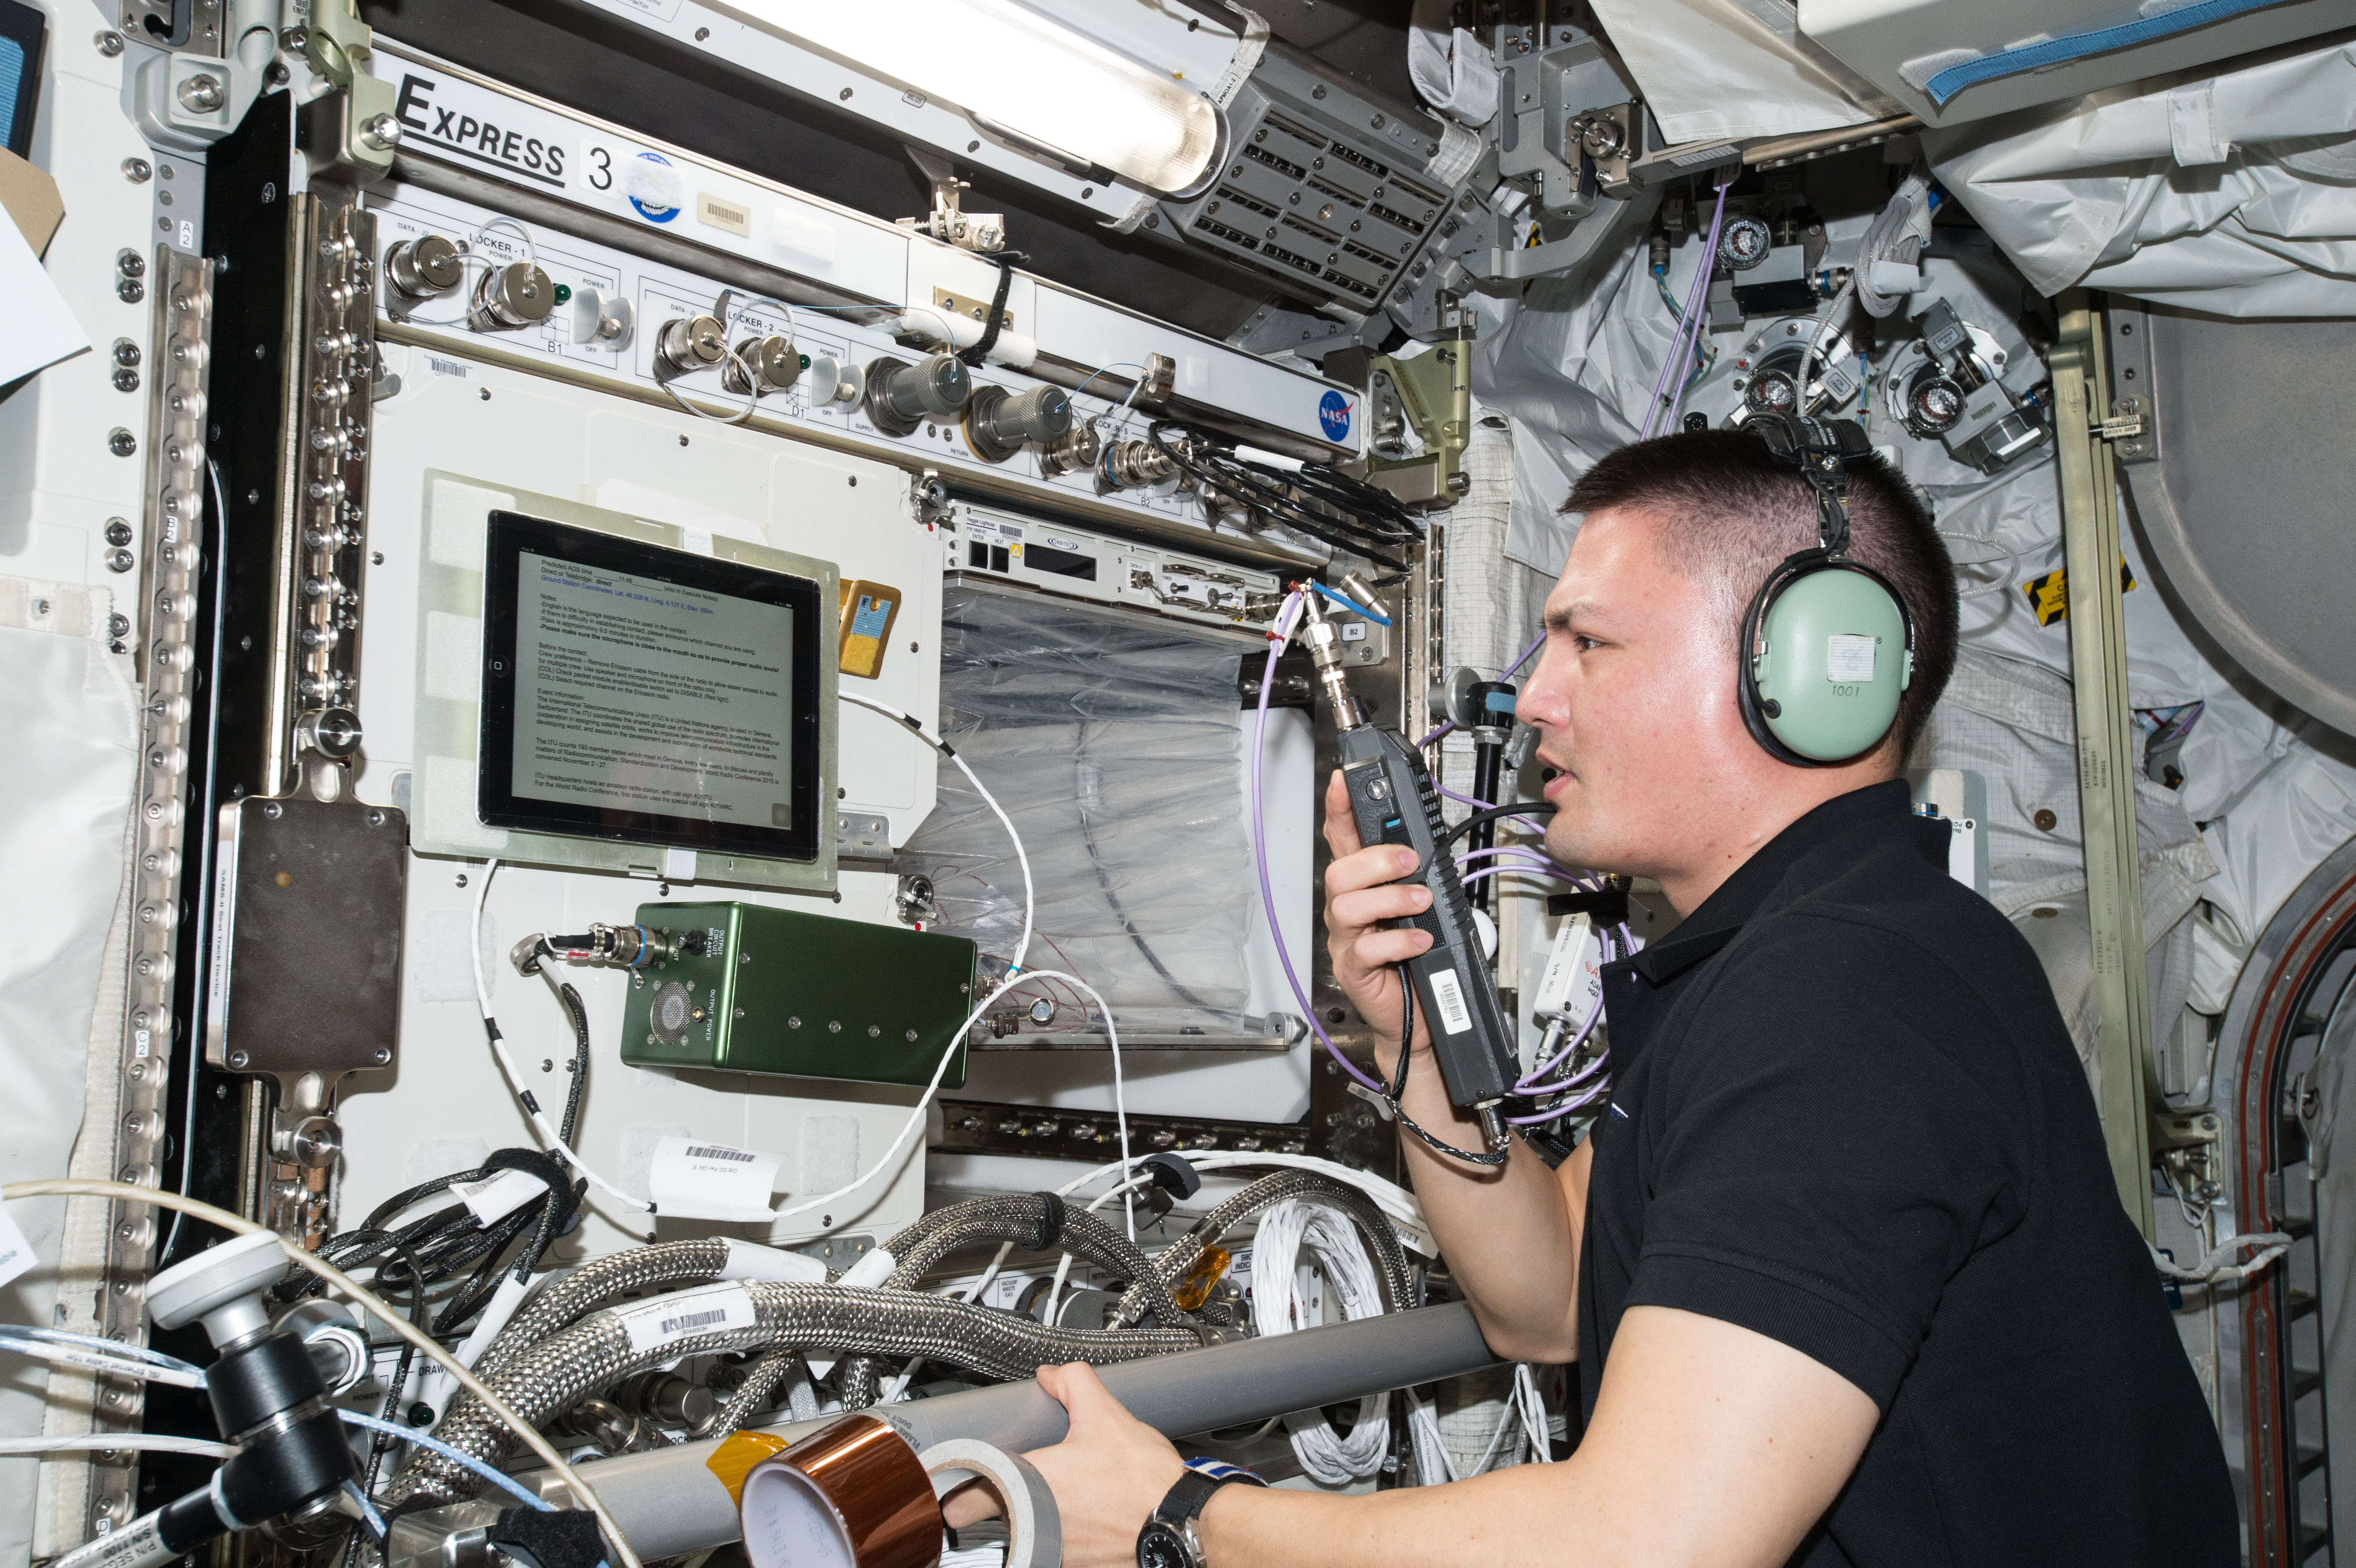 major competition stations ham radio NASA astronaut Kjell Lindgren